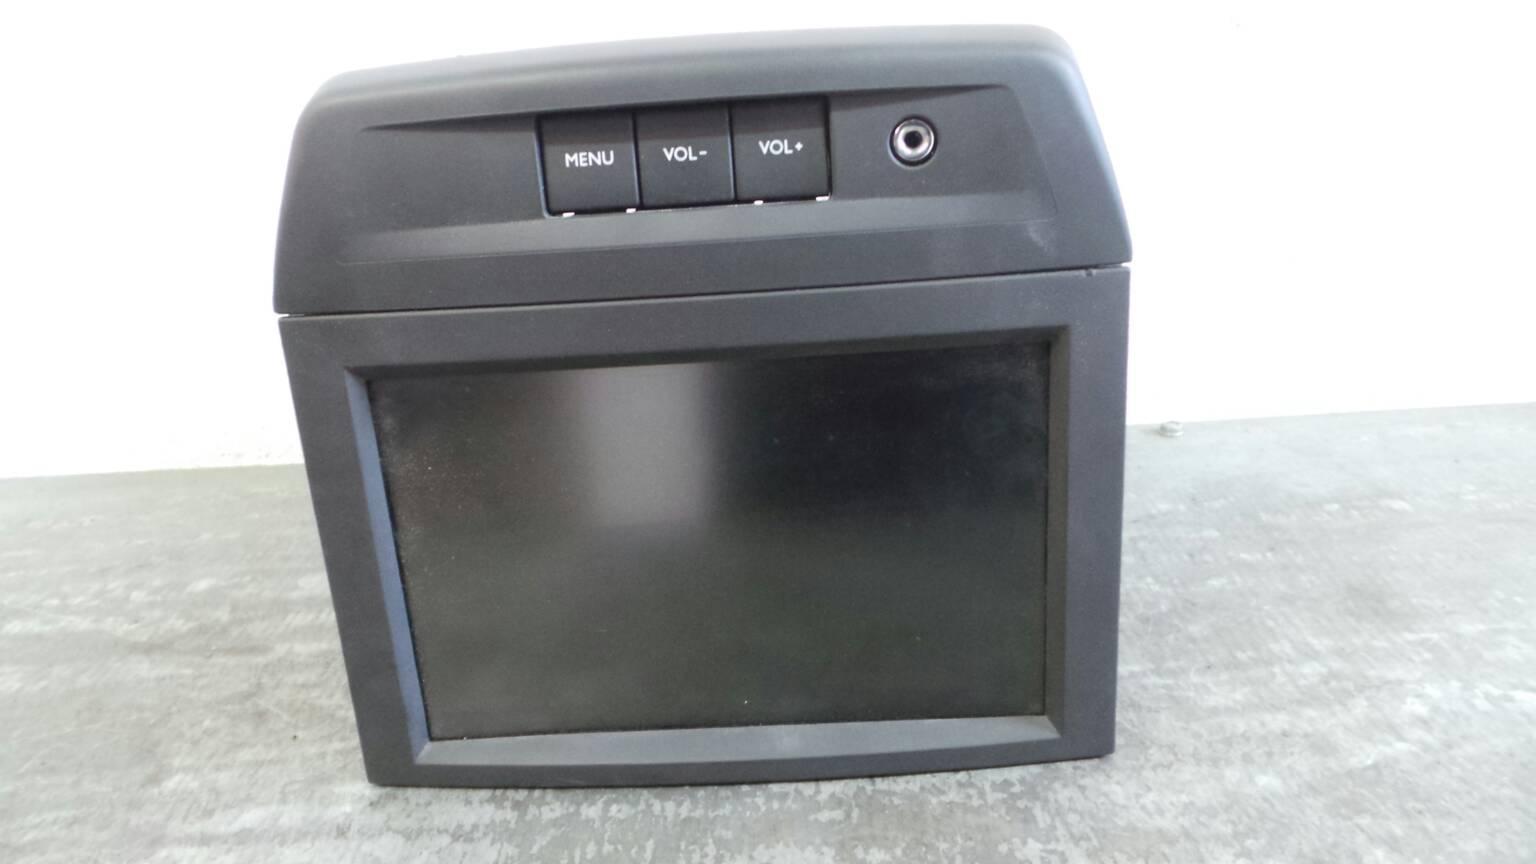 Radio Citroen Berlingo Box B9 1 6 Hdi 110 B Parts